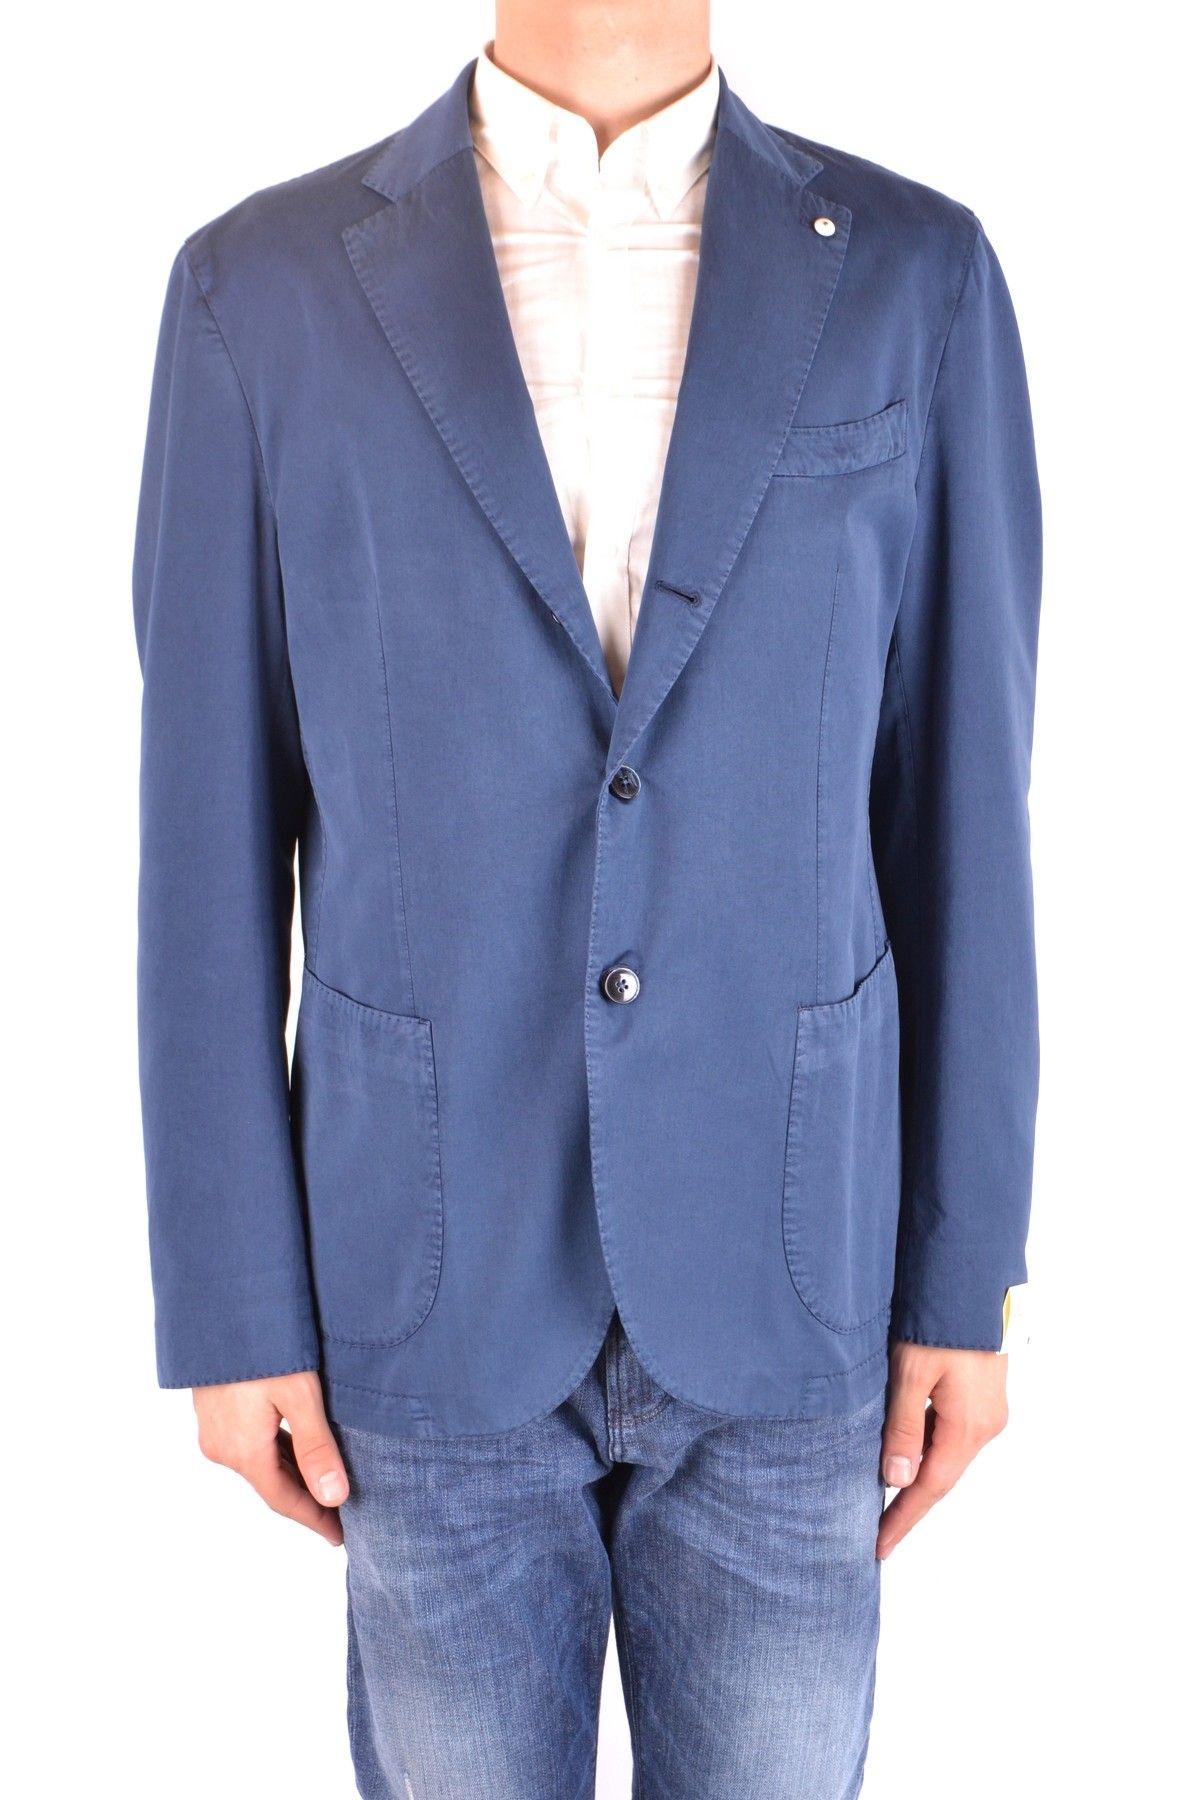 L.B.M Men's Blazer In Blue